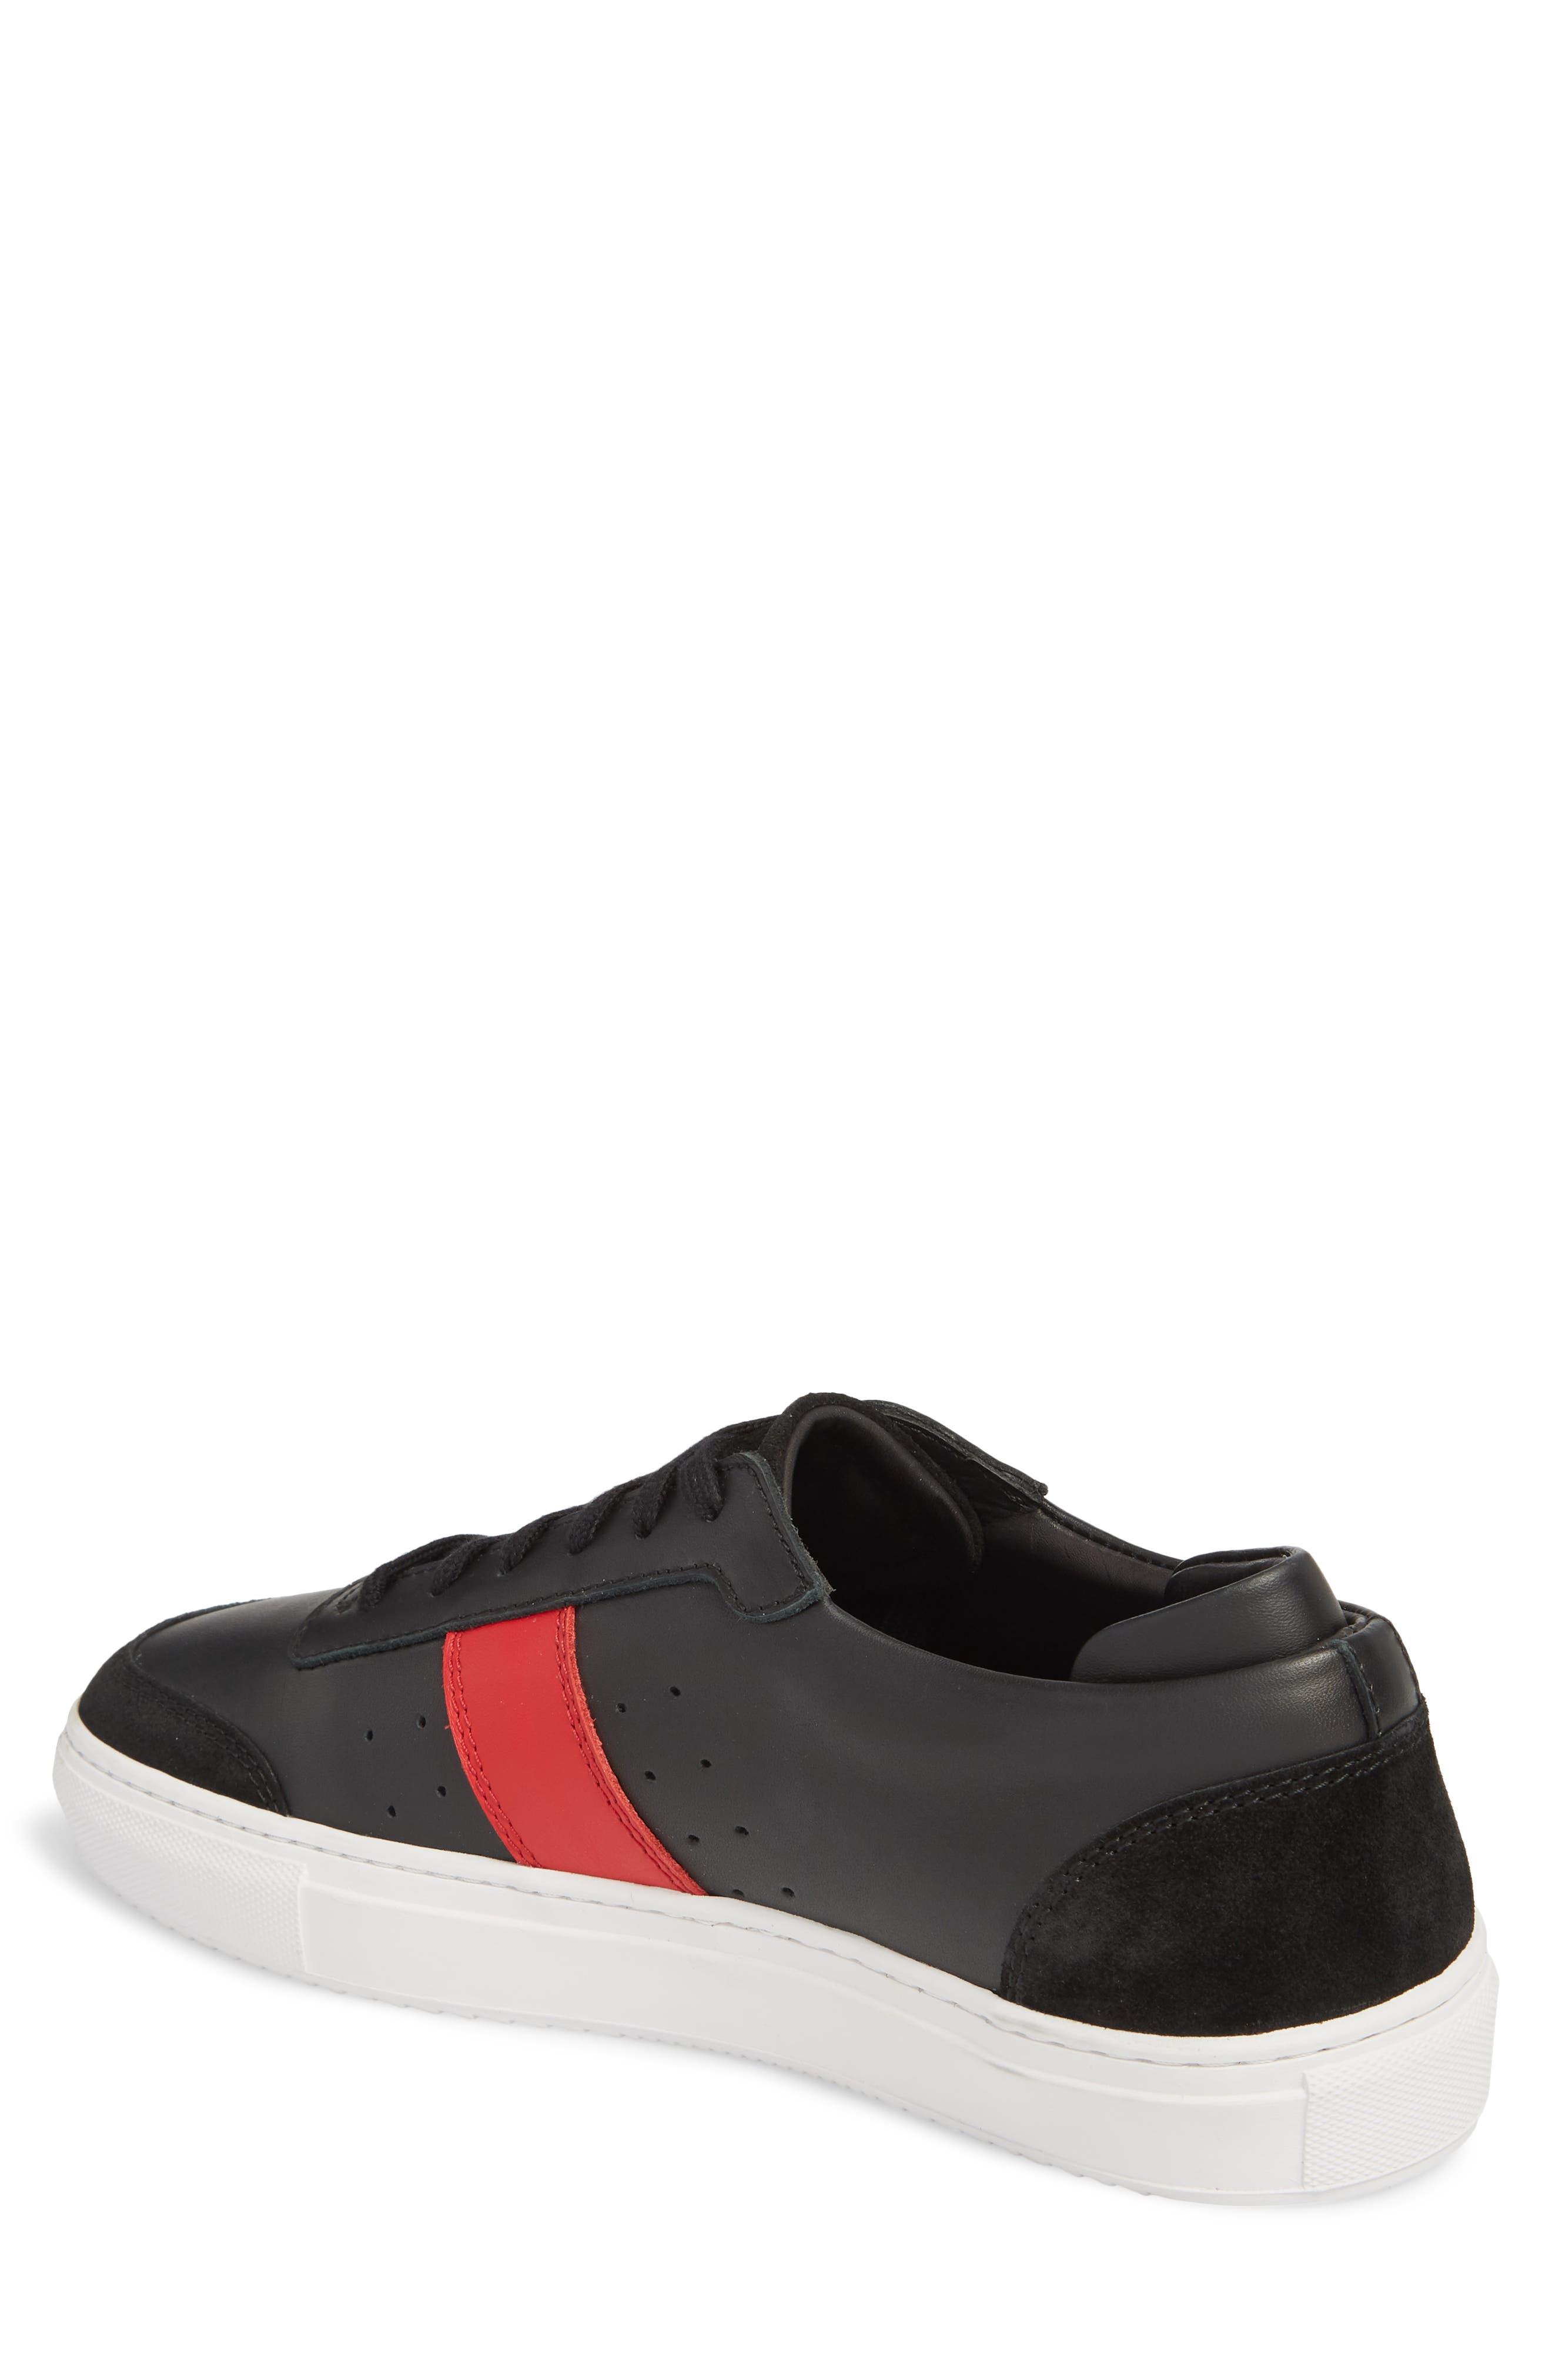 Dunk Sneaker,                             Alternate thumbnail 2, color,                             BLACK/ BLACK